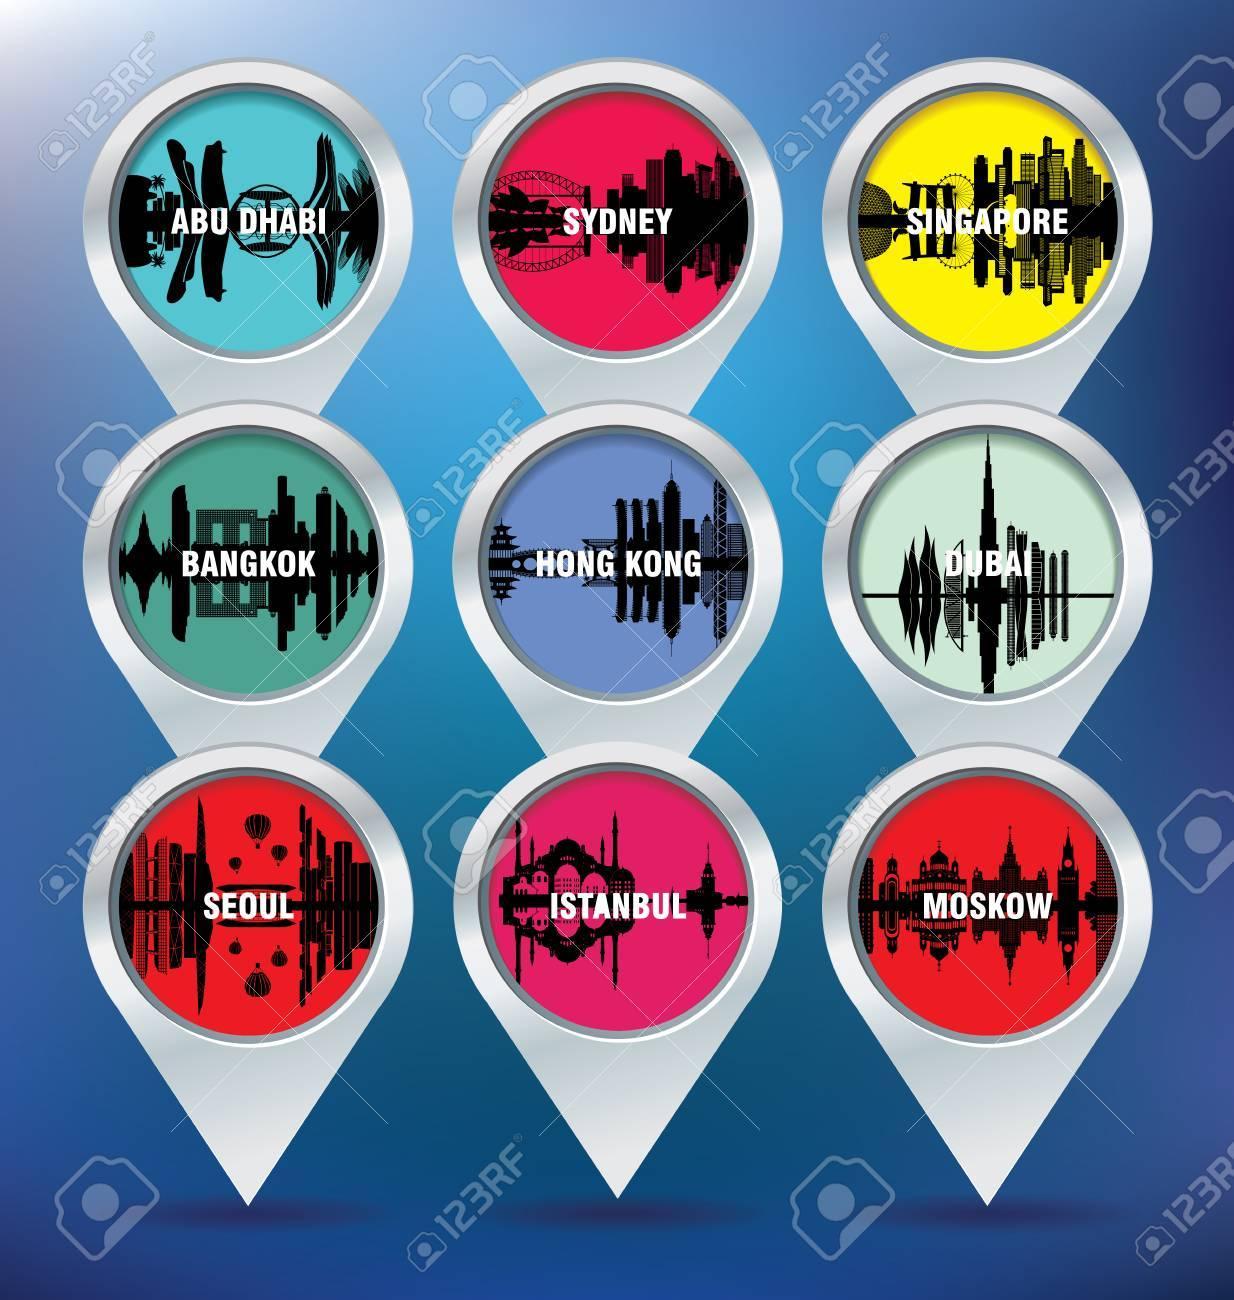 Map pins with Abu Dhabi, Sydney, Singapore, Bangkok, Hong Kong,